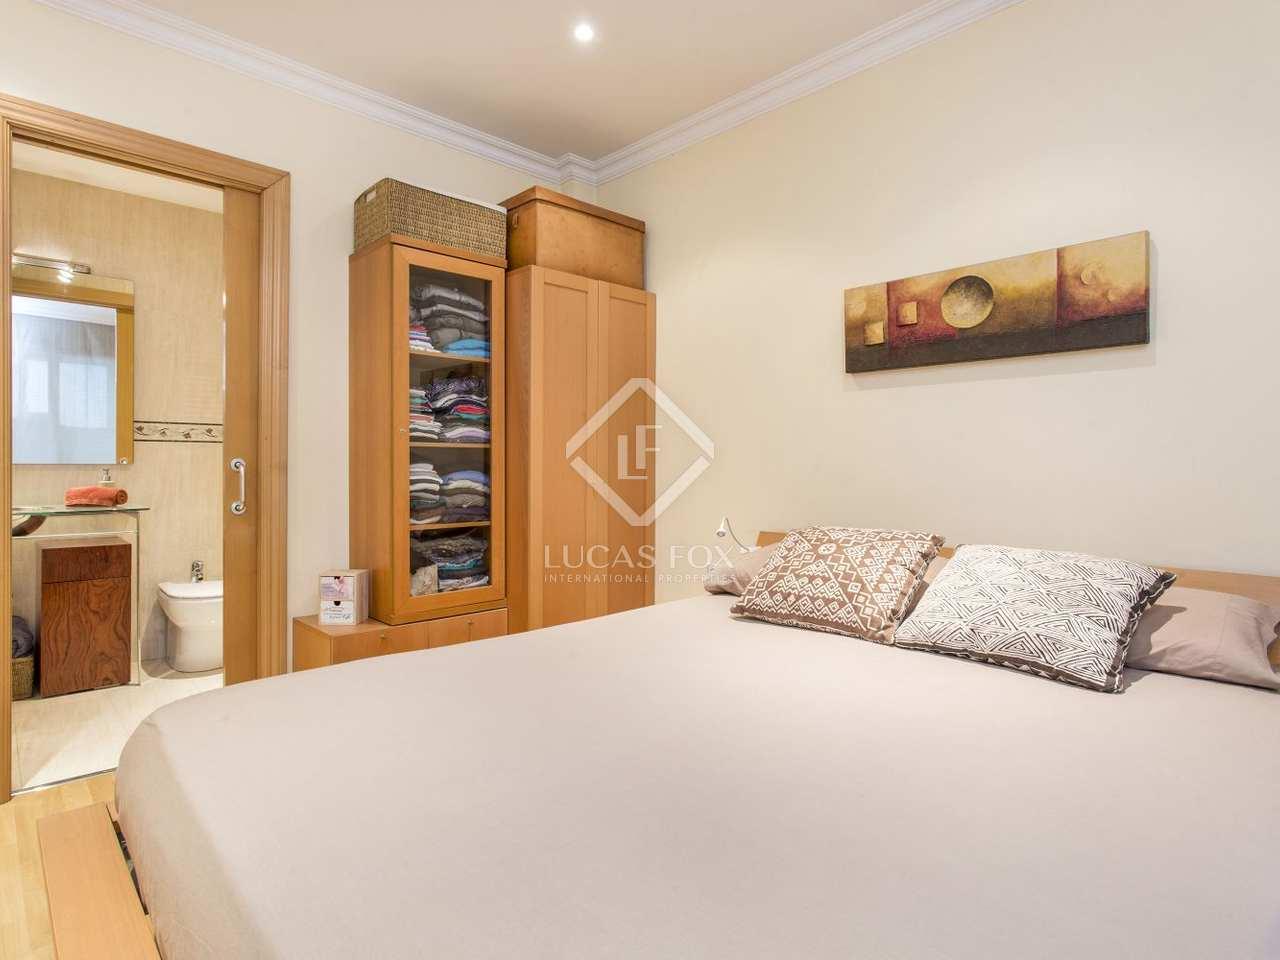 Appartement de 75m a vendre gr cia barcelone - Acheter appartement a barcelone ...